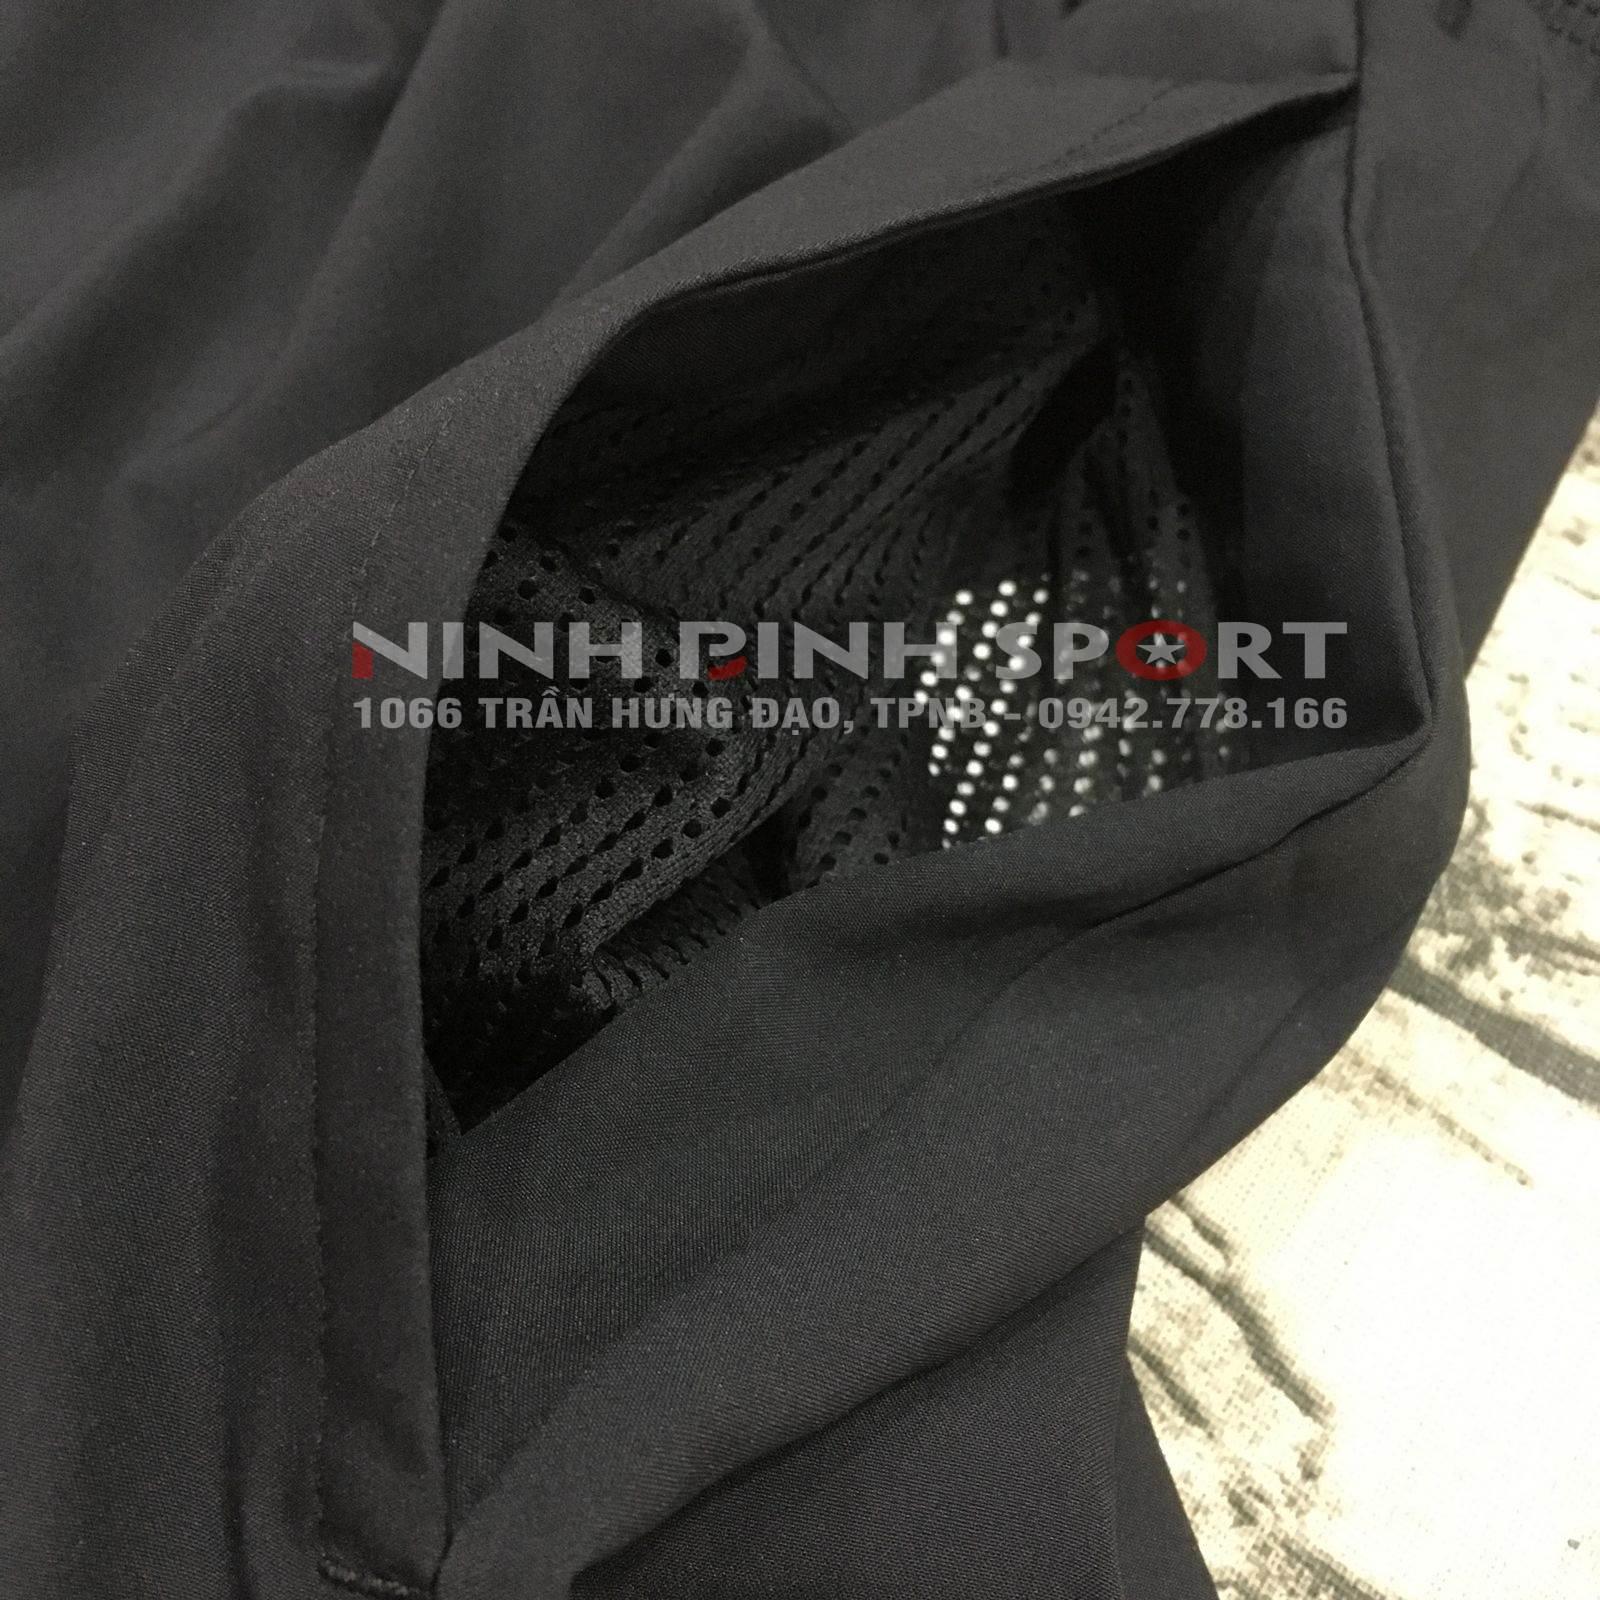 Quần thể thao nam Nike AS Flex Short Woven 927527-010